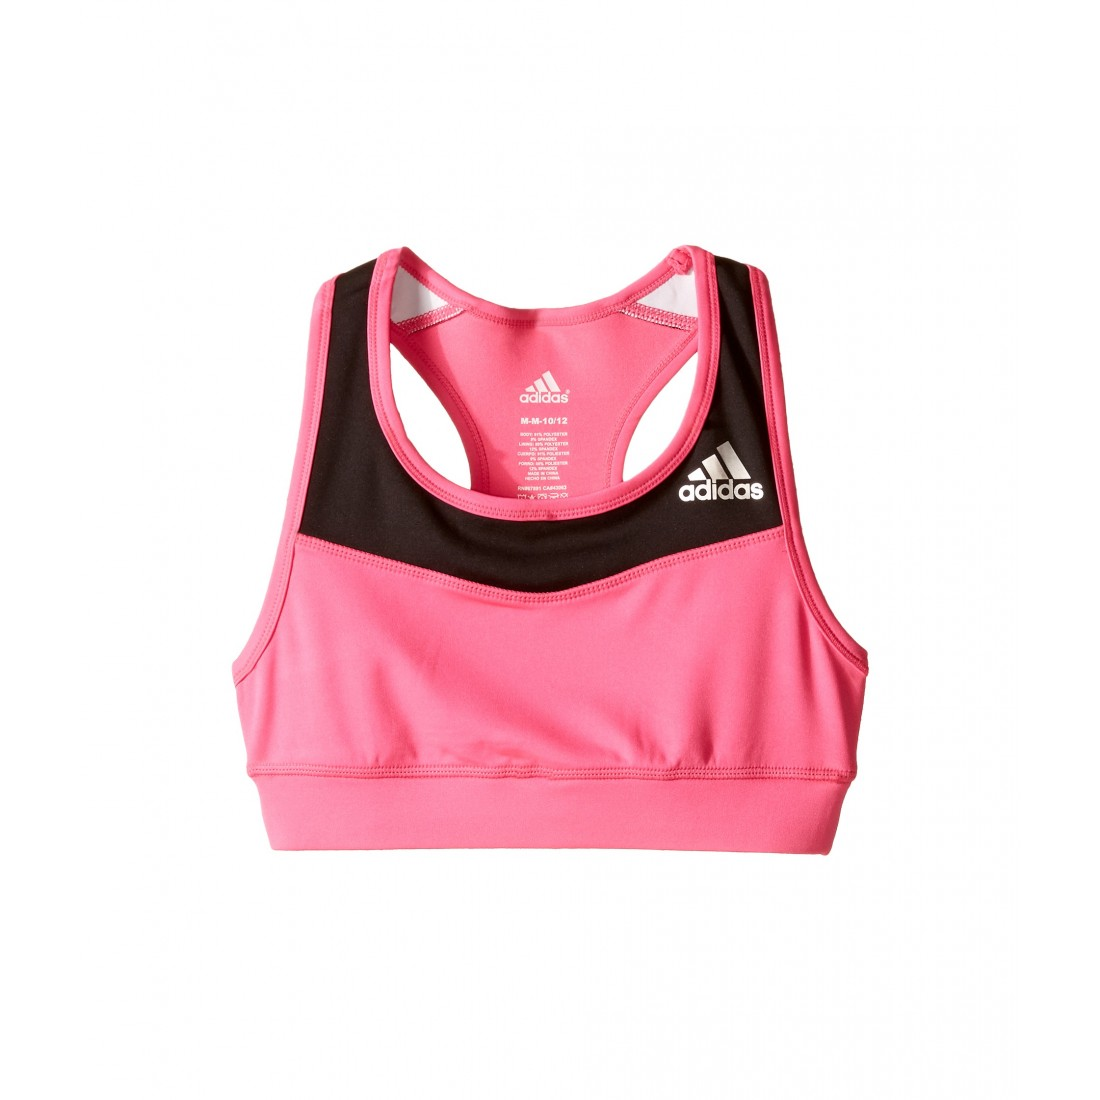 c11a5badfd3 adidas Kids Gym Bra (Big Kids) ZPSKU 8728152 Shock Pink Black